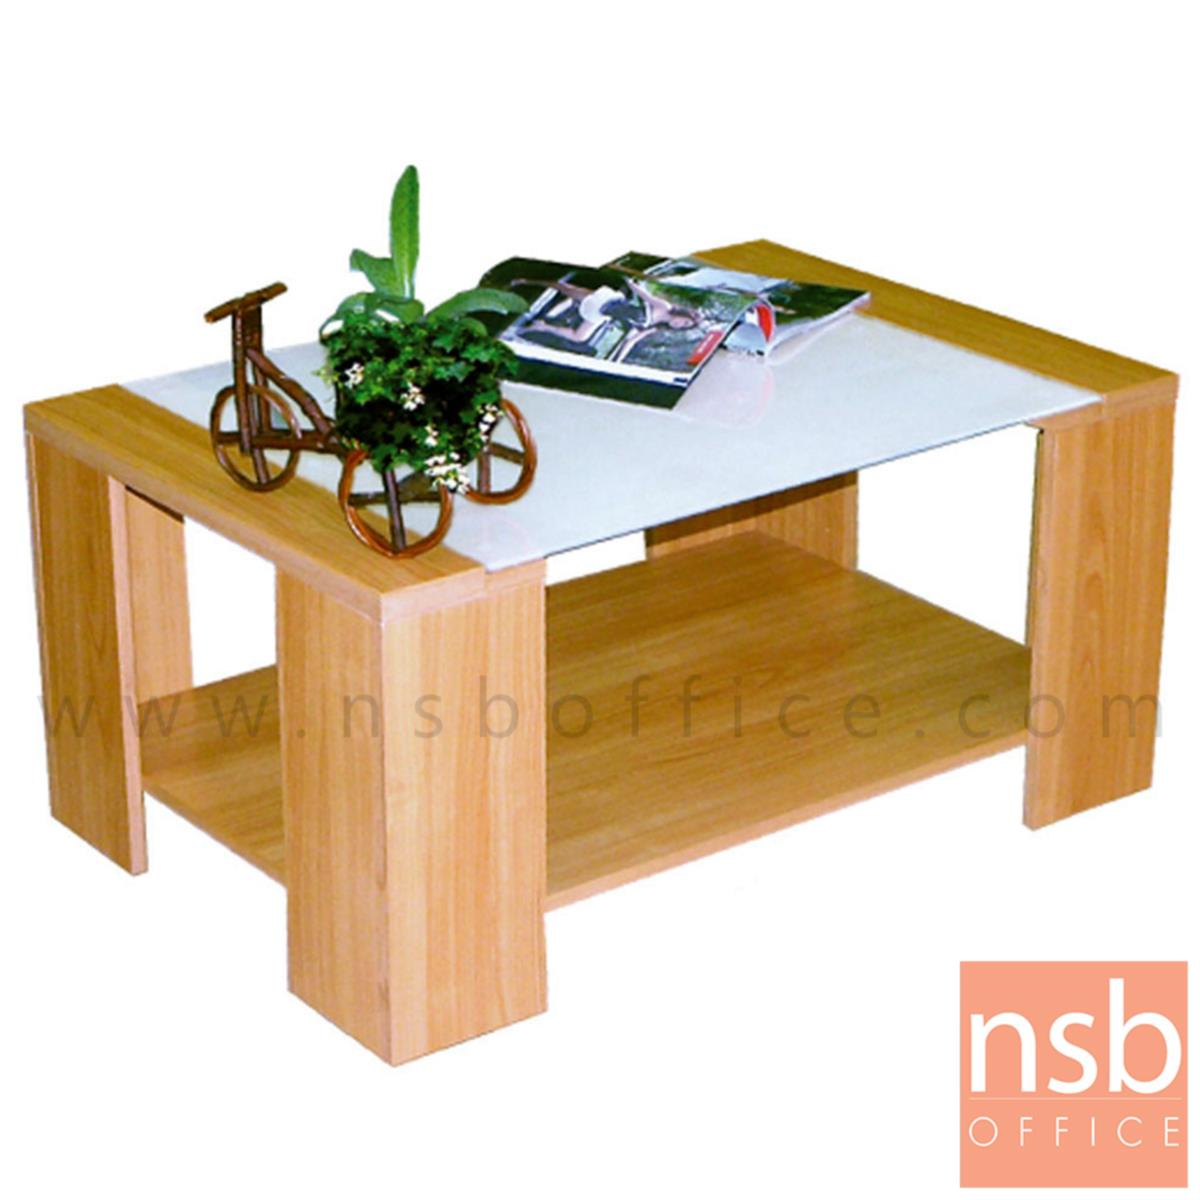 B13A062:โต๊ะกลางกระจก  รุ่น Lakebottom (Lakebottom) ขนาด 90W cm. โครงไม้